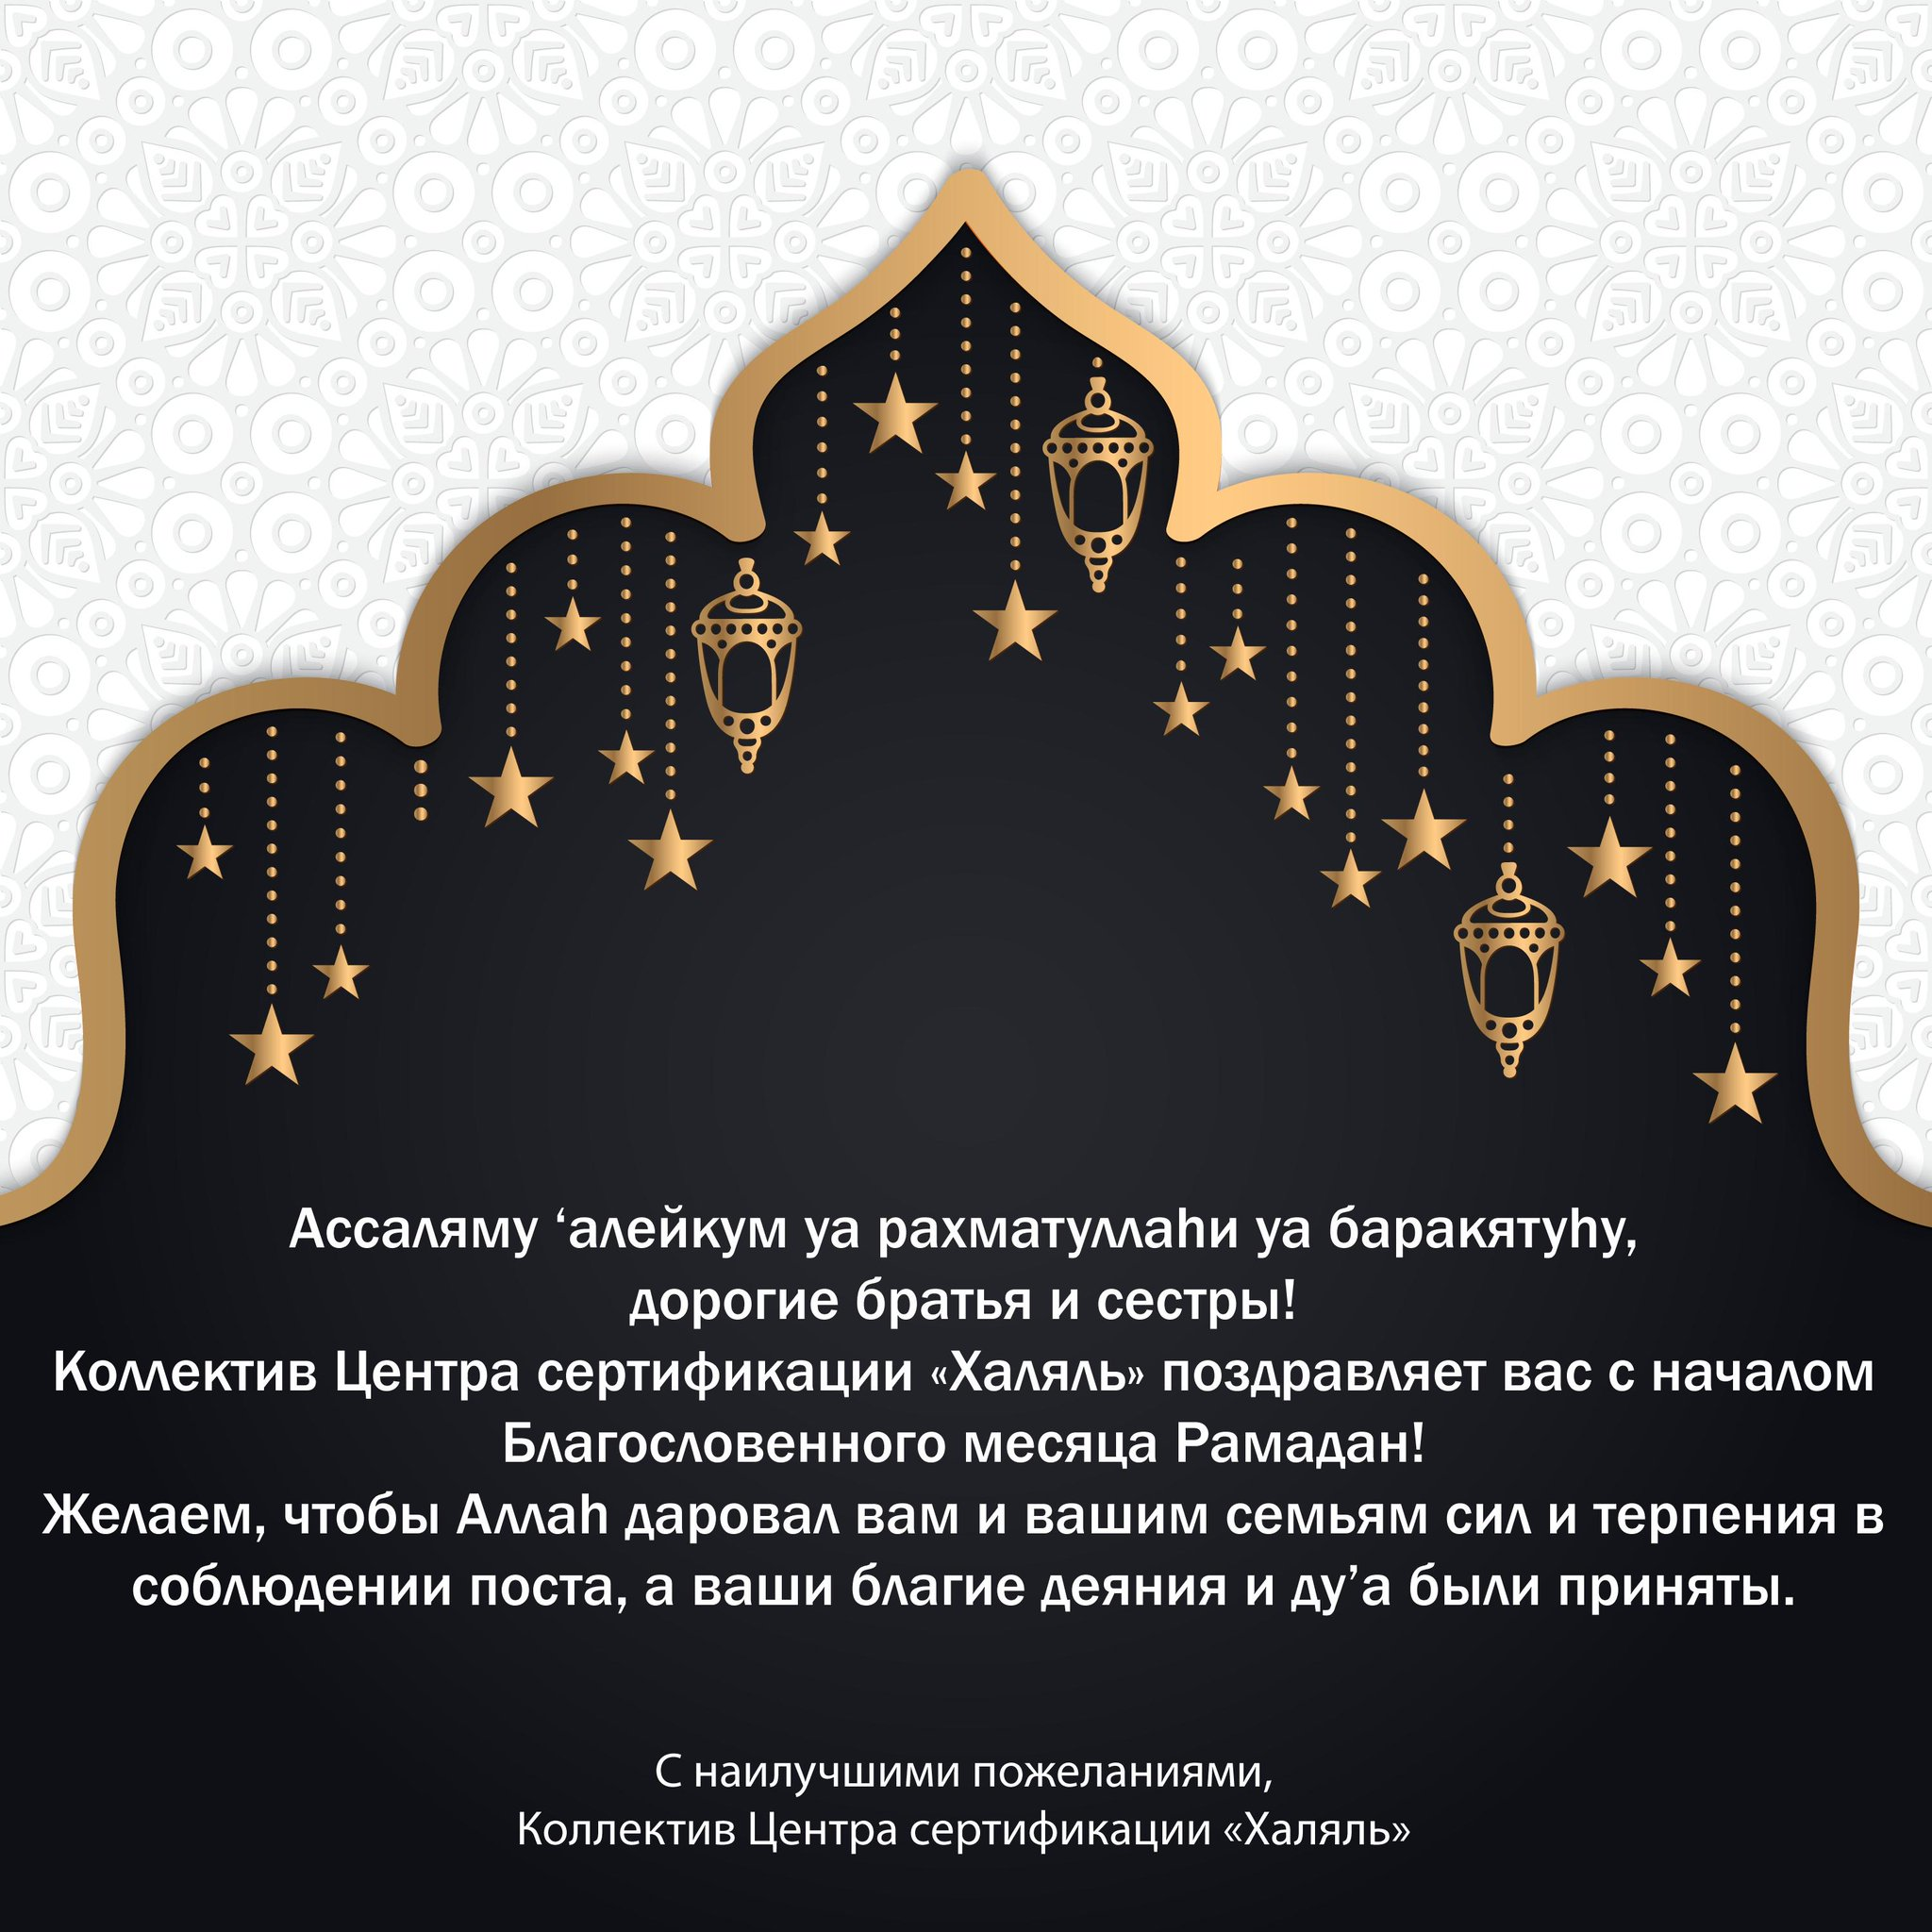 пожелания человеку на рамадан месяц своё